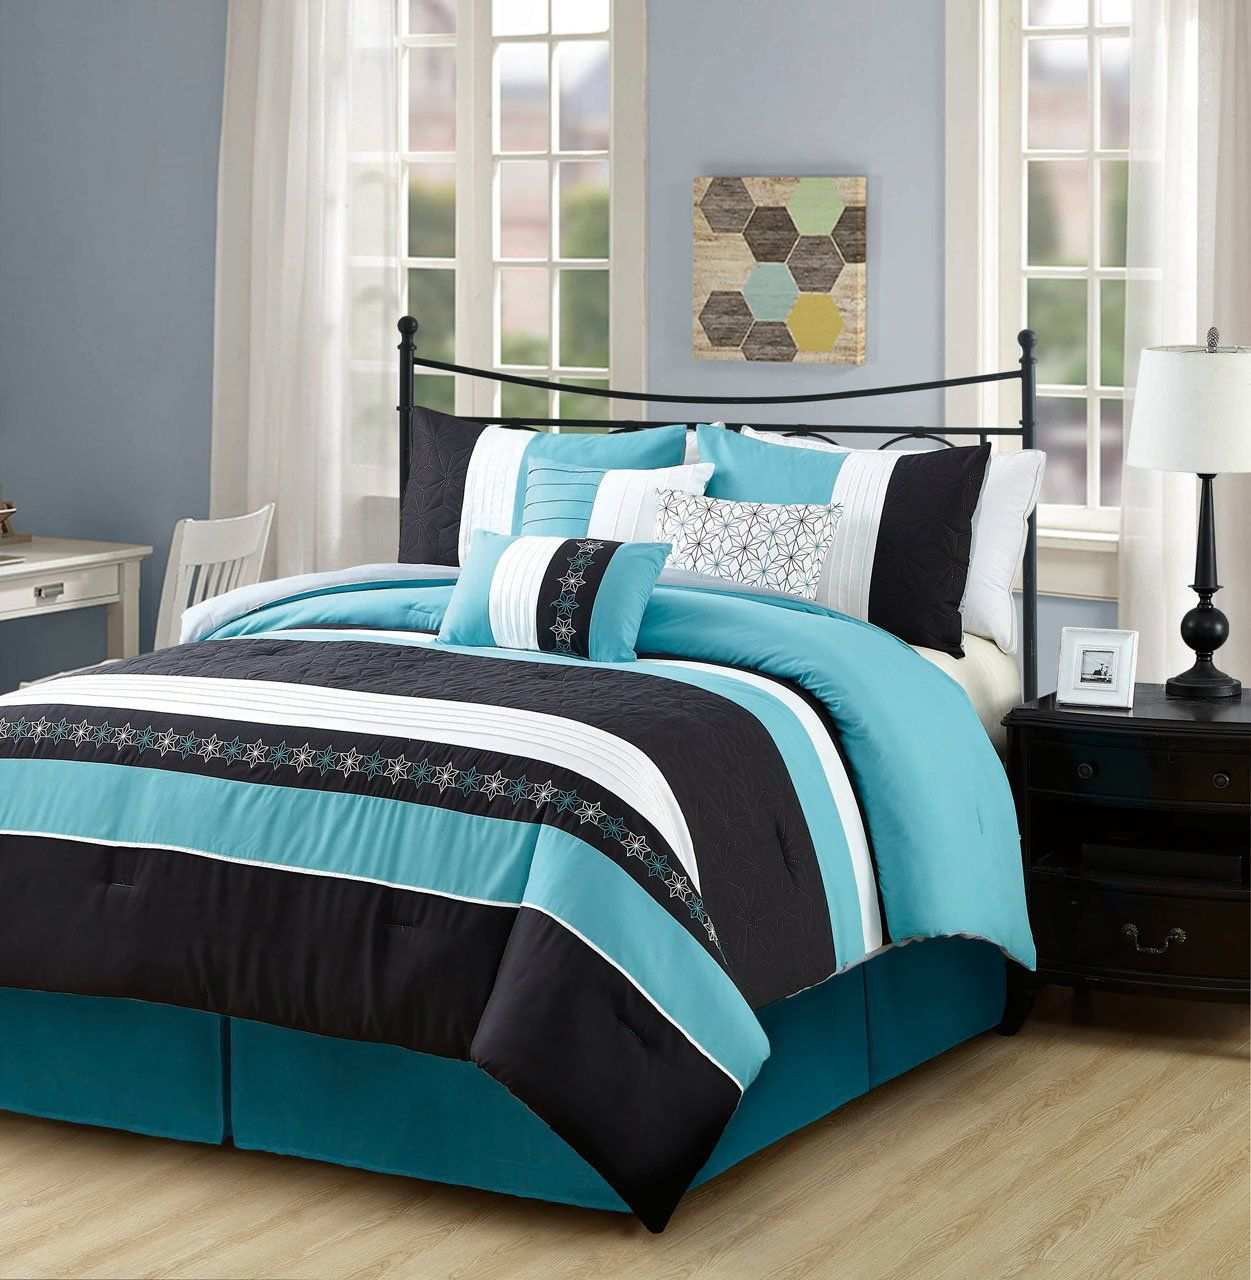 7 Piece Cherika Turquoise Black Comforter Set Loskutnoe Odeyalo Odeyalo Teal and black bedding sets